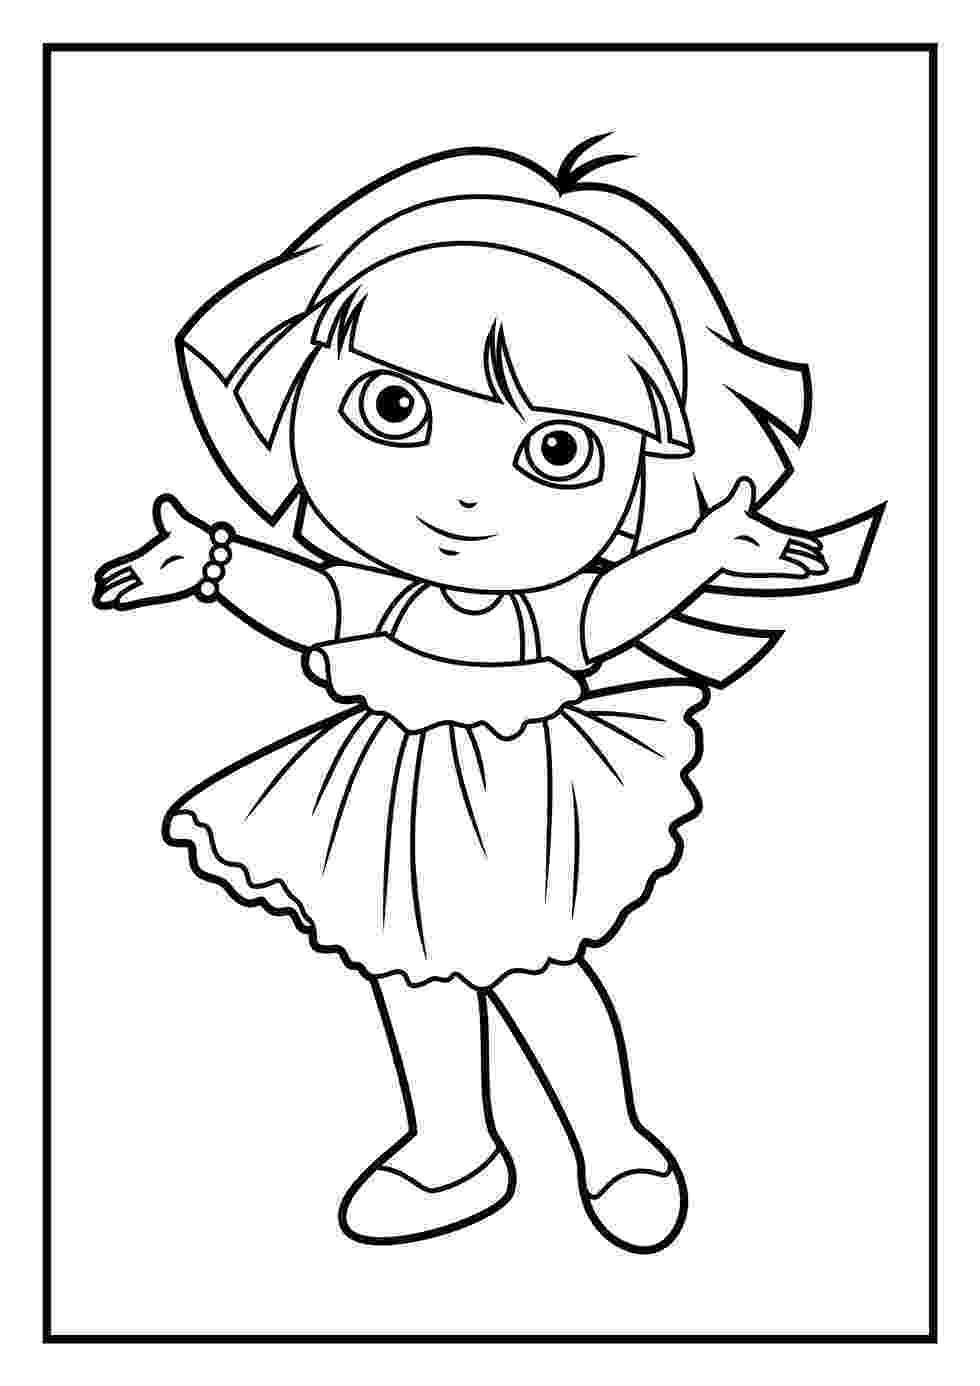 dora printing pages free printable dora the explorer coloring pages for kids printing pages dora